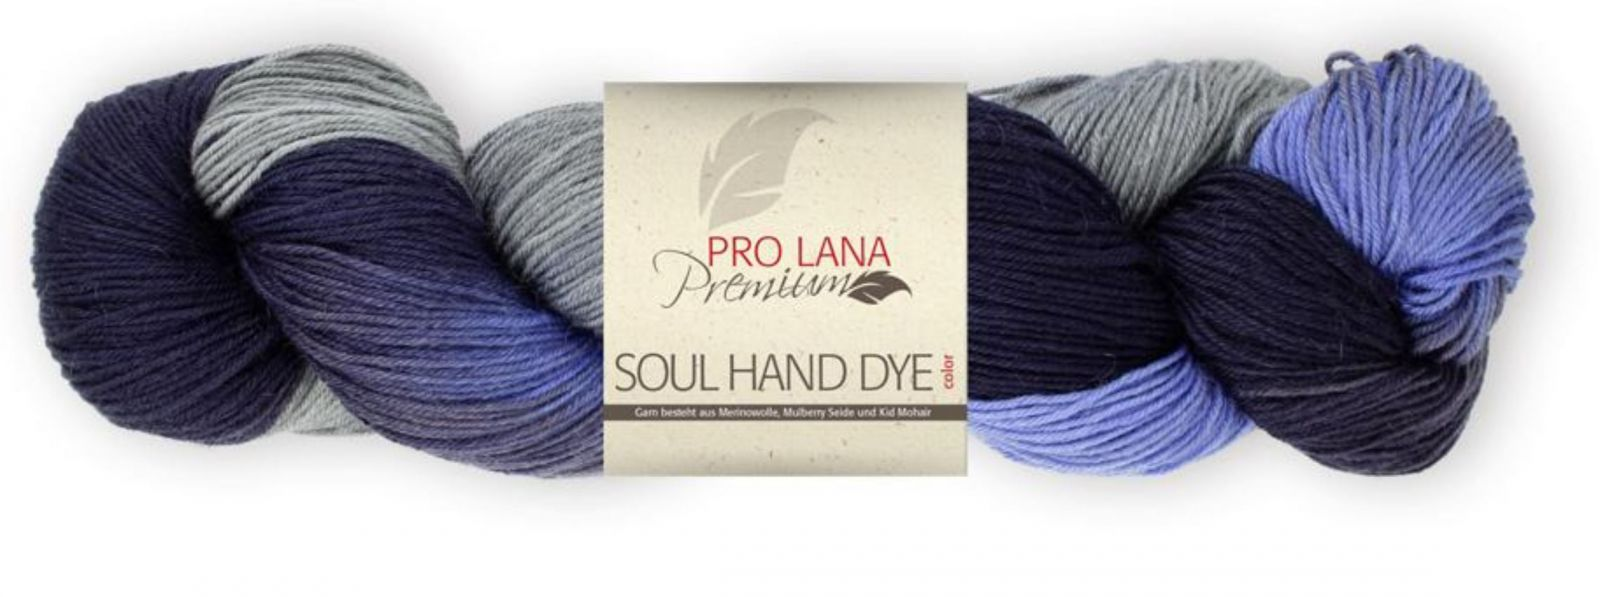 PRO LANA Premium Soul Hand Dye color 84